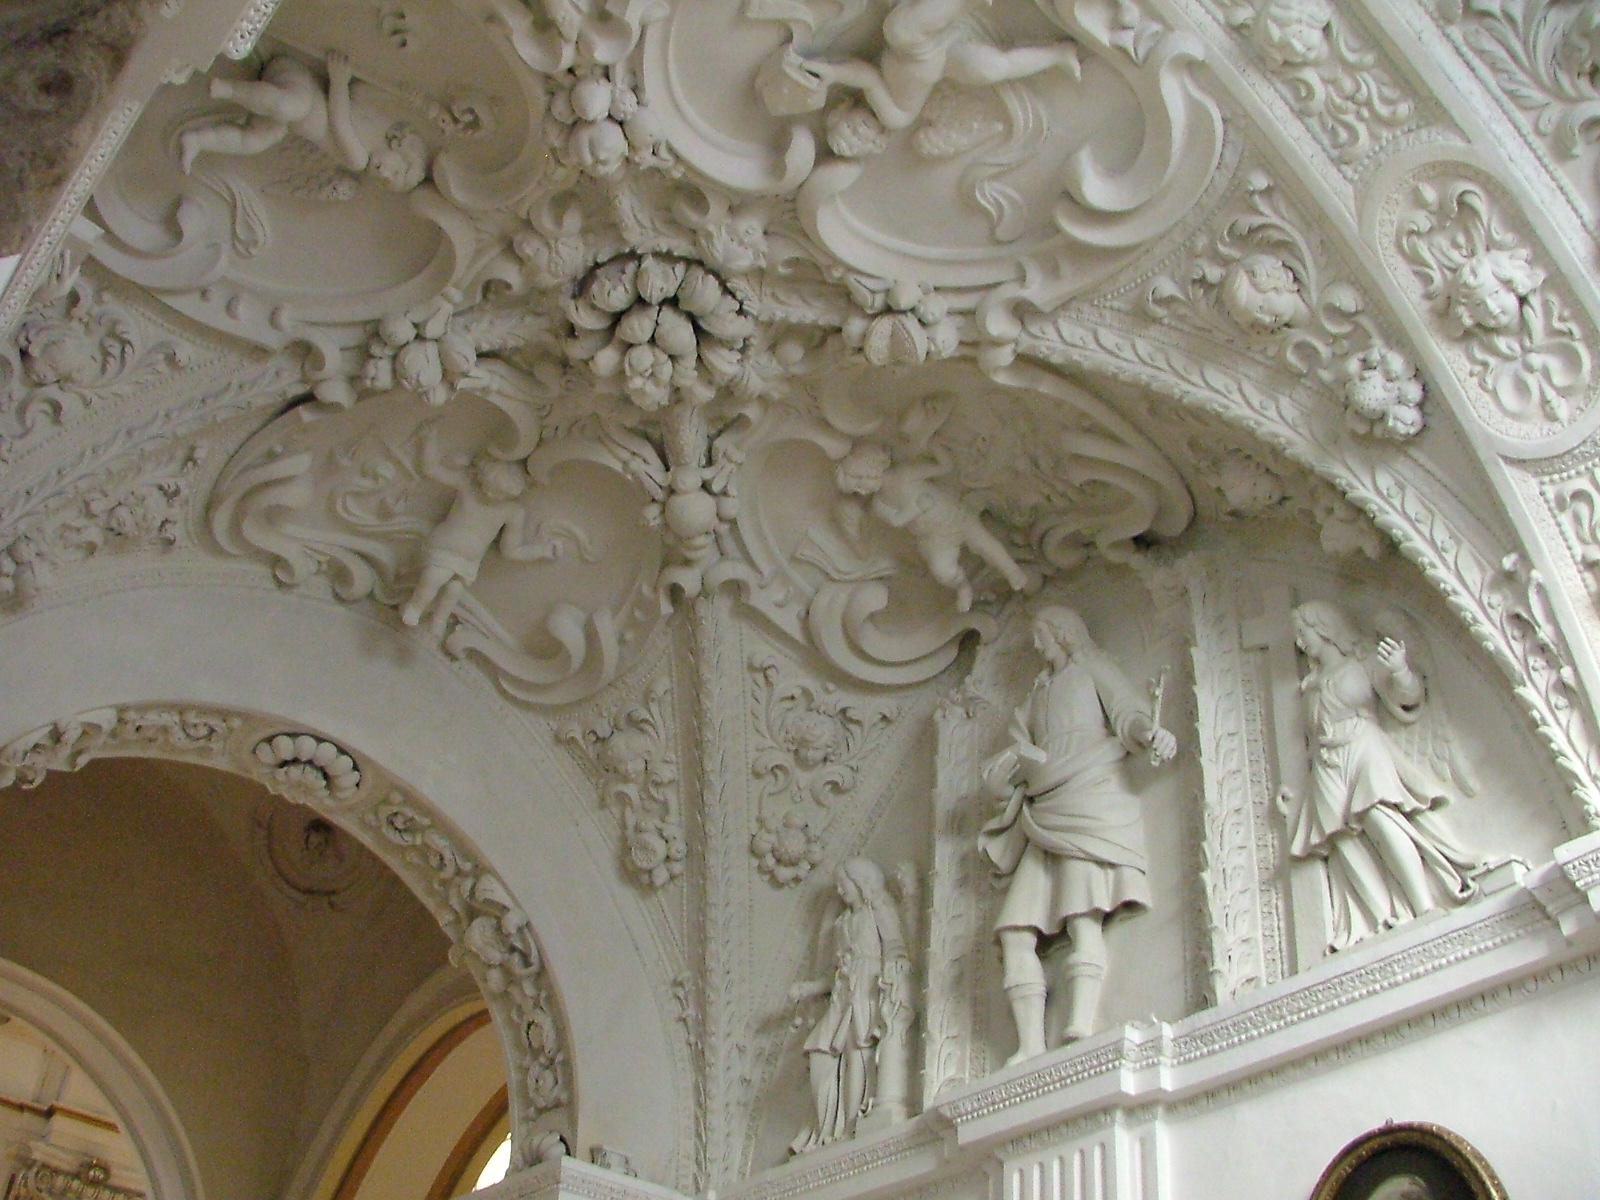 File:Cattedrale - stucchi settecenteschi.JPG - Wikimedia Commons